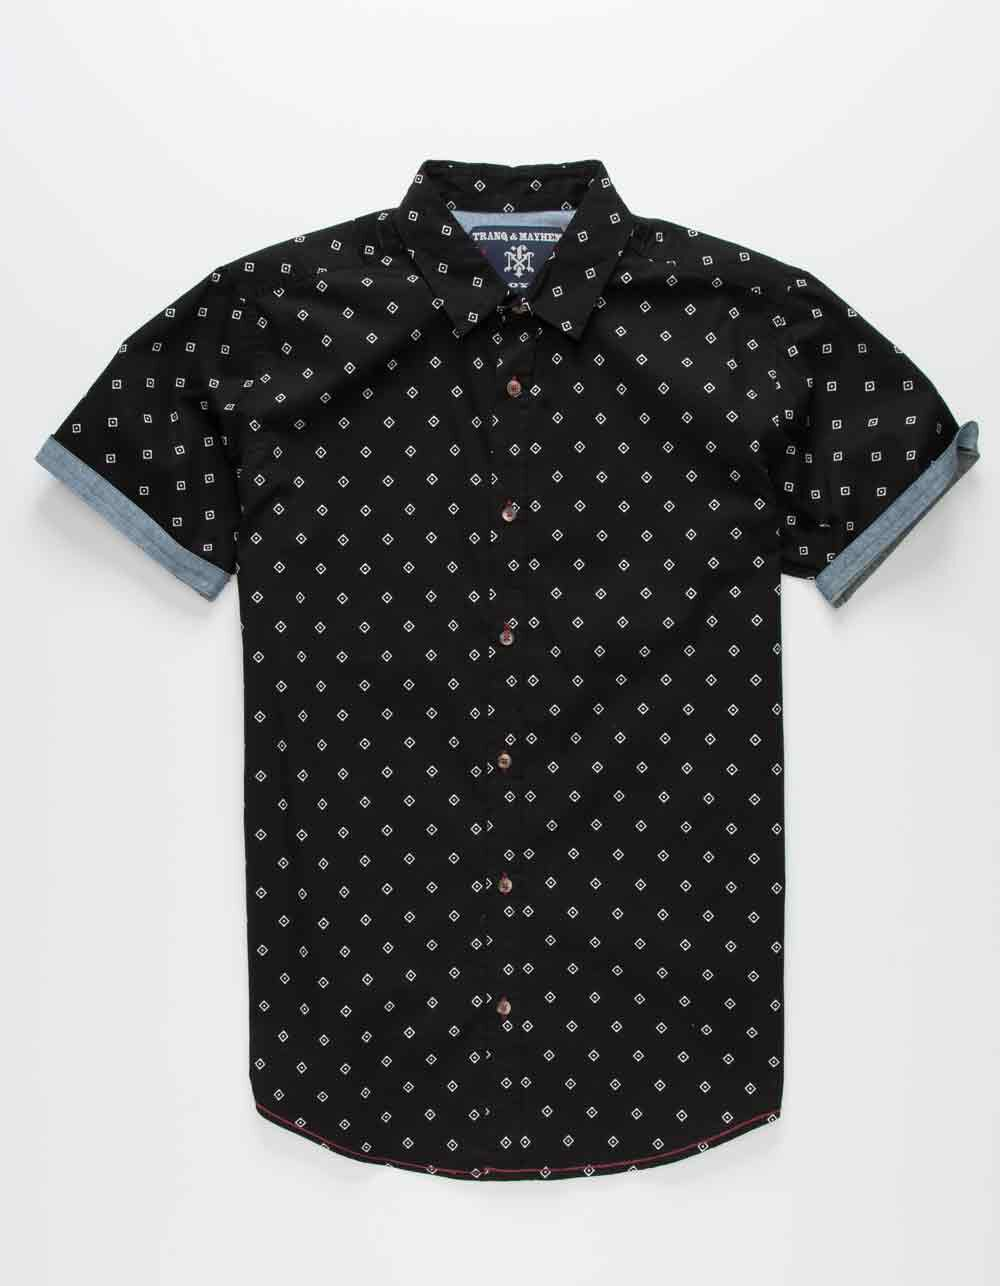 Image of TRANQUILITY & MAYHEM Diamonds Boys Shirt